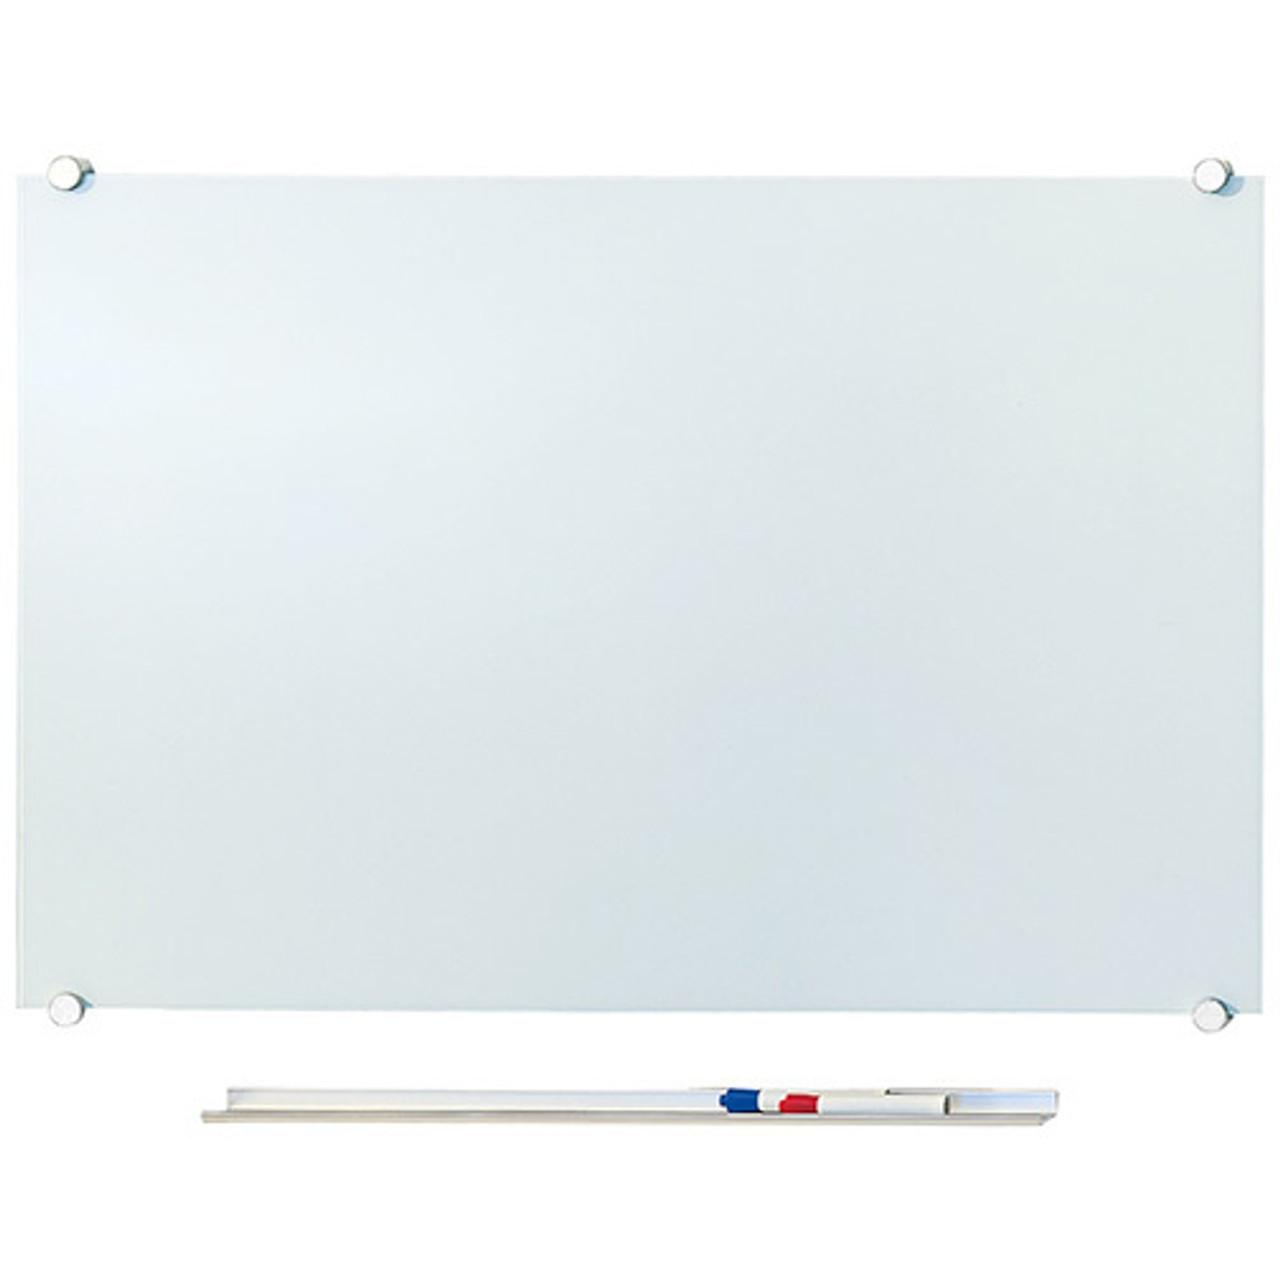 Peter Pepper GB Starphire Glass Dry Erase Boards